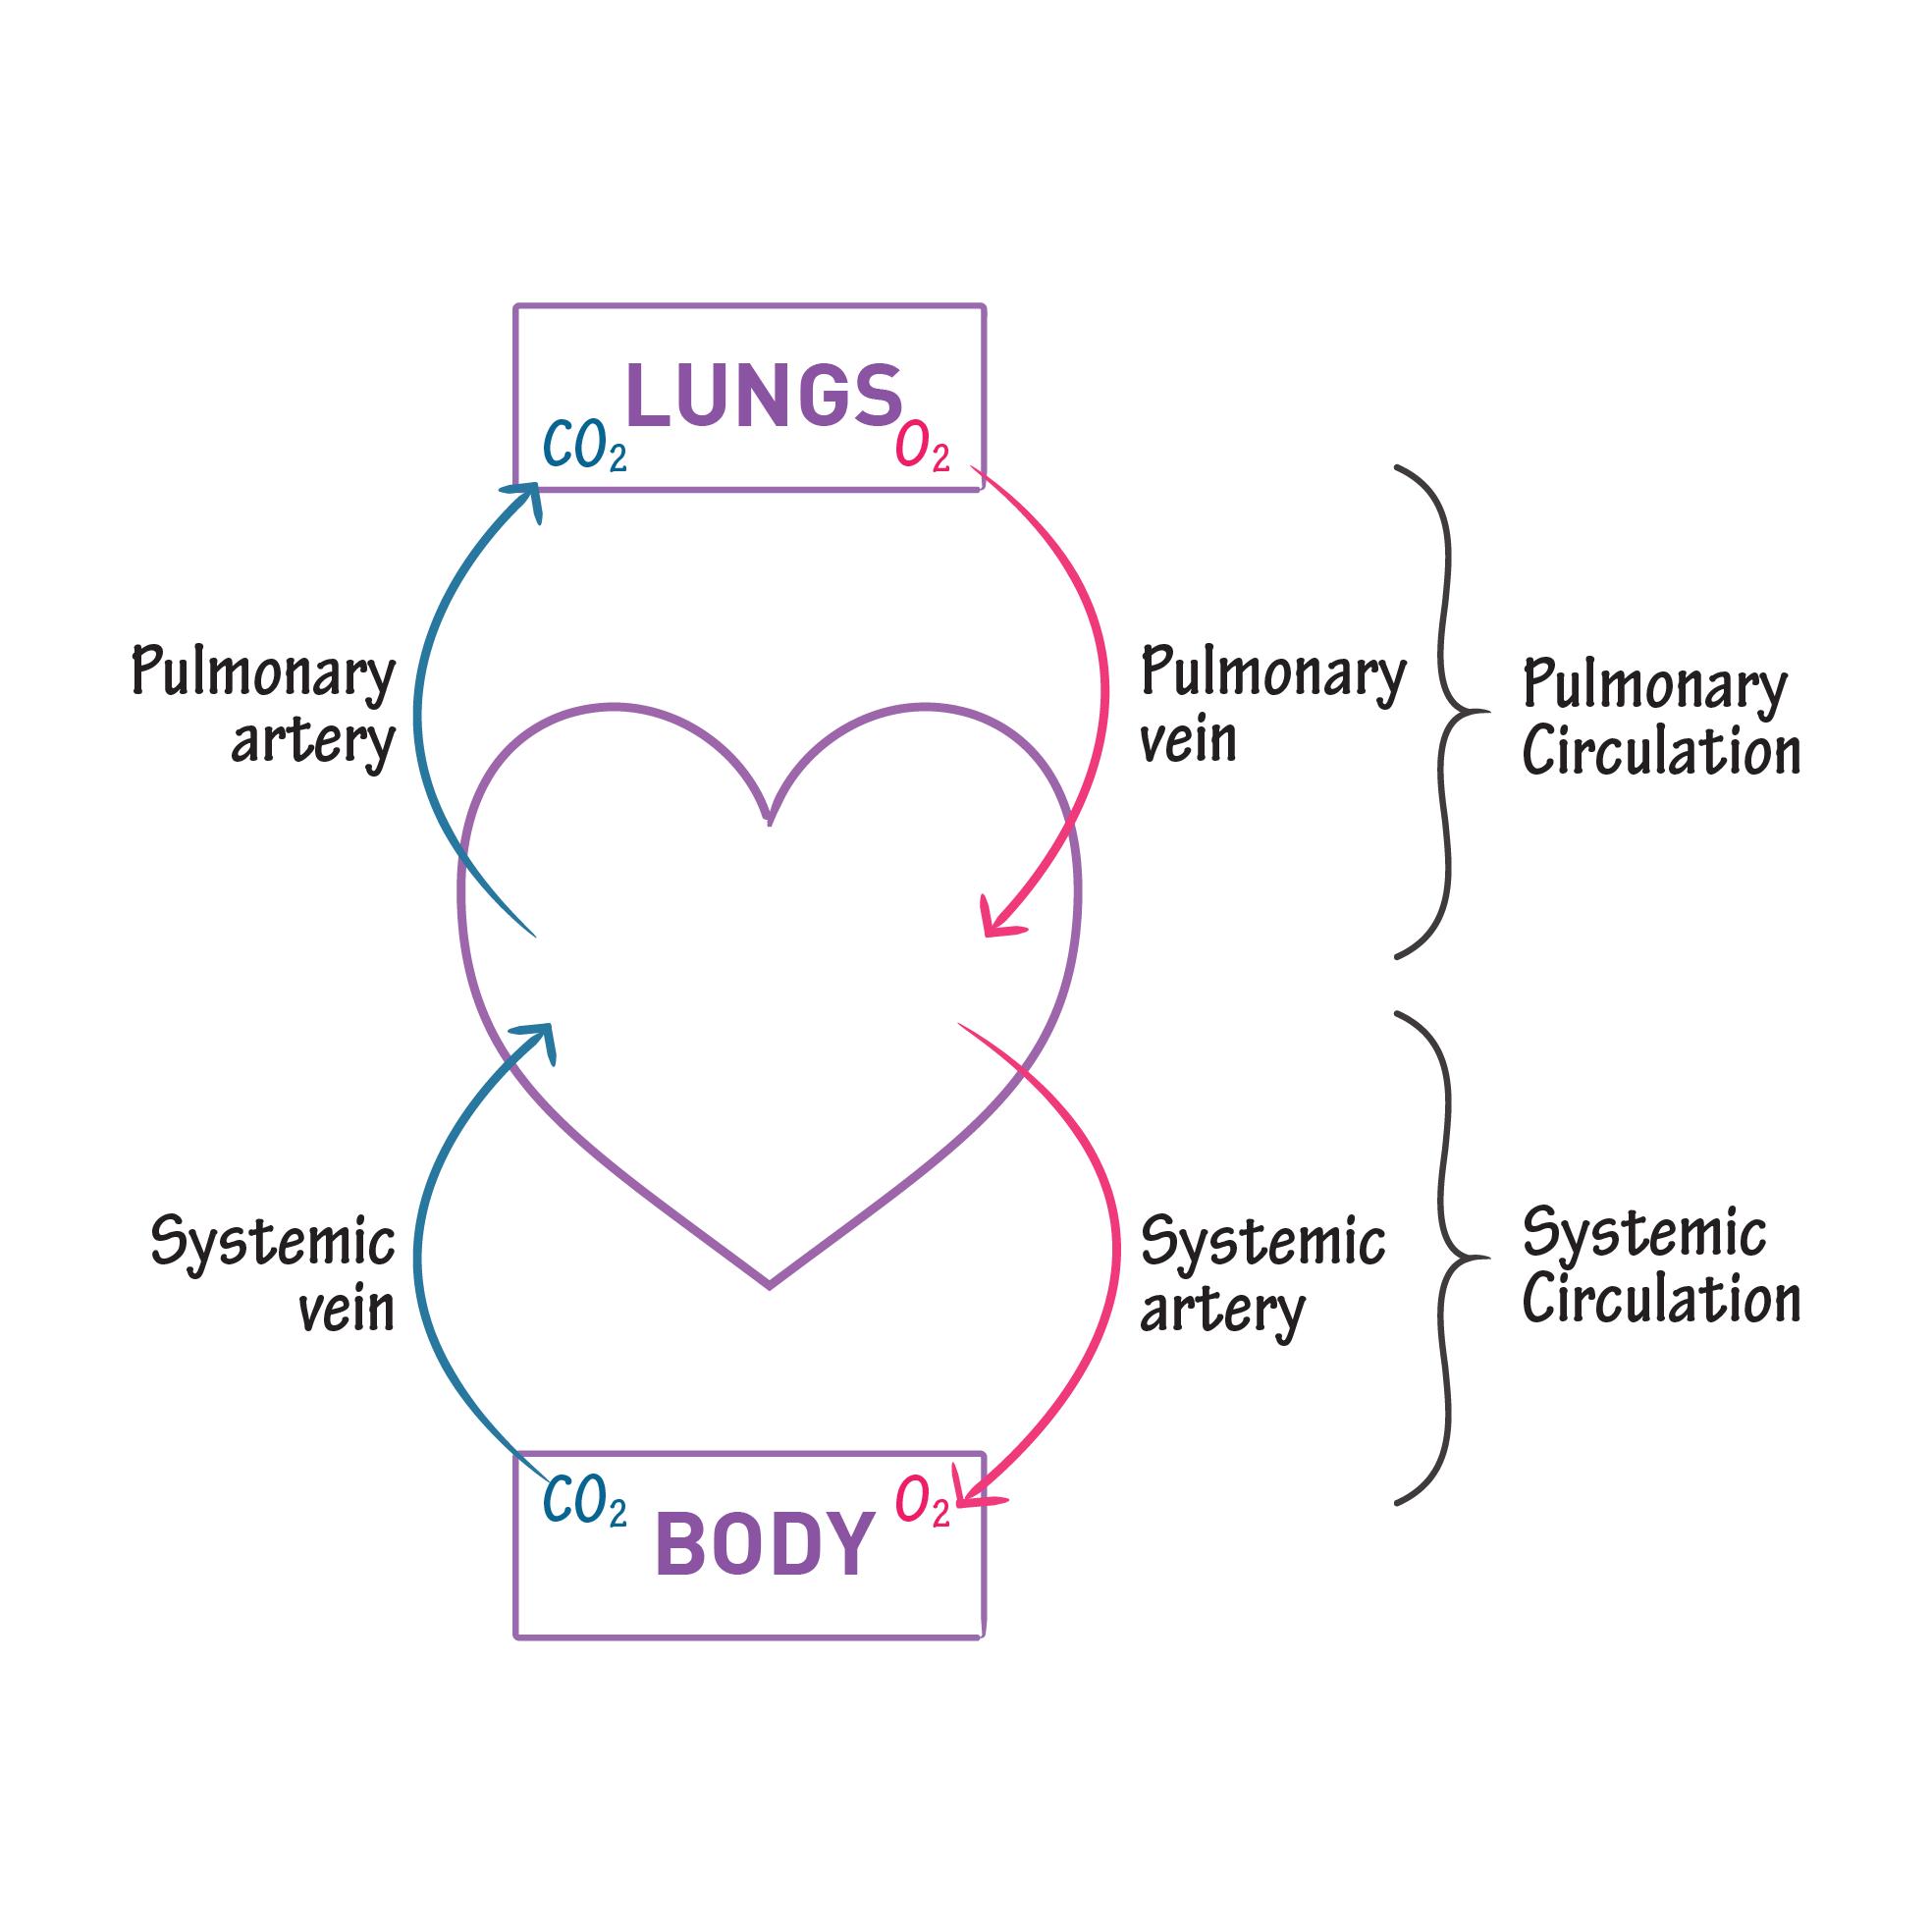 Gross Anatomy Glossary: Systemic vs. Pulmonary Circulation | Draw It ...